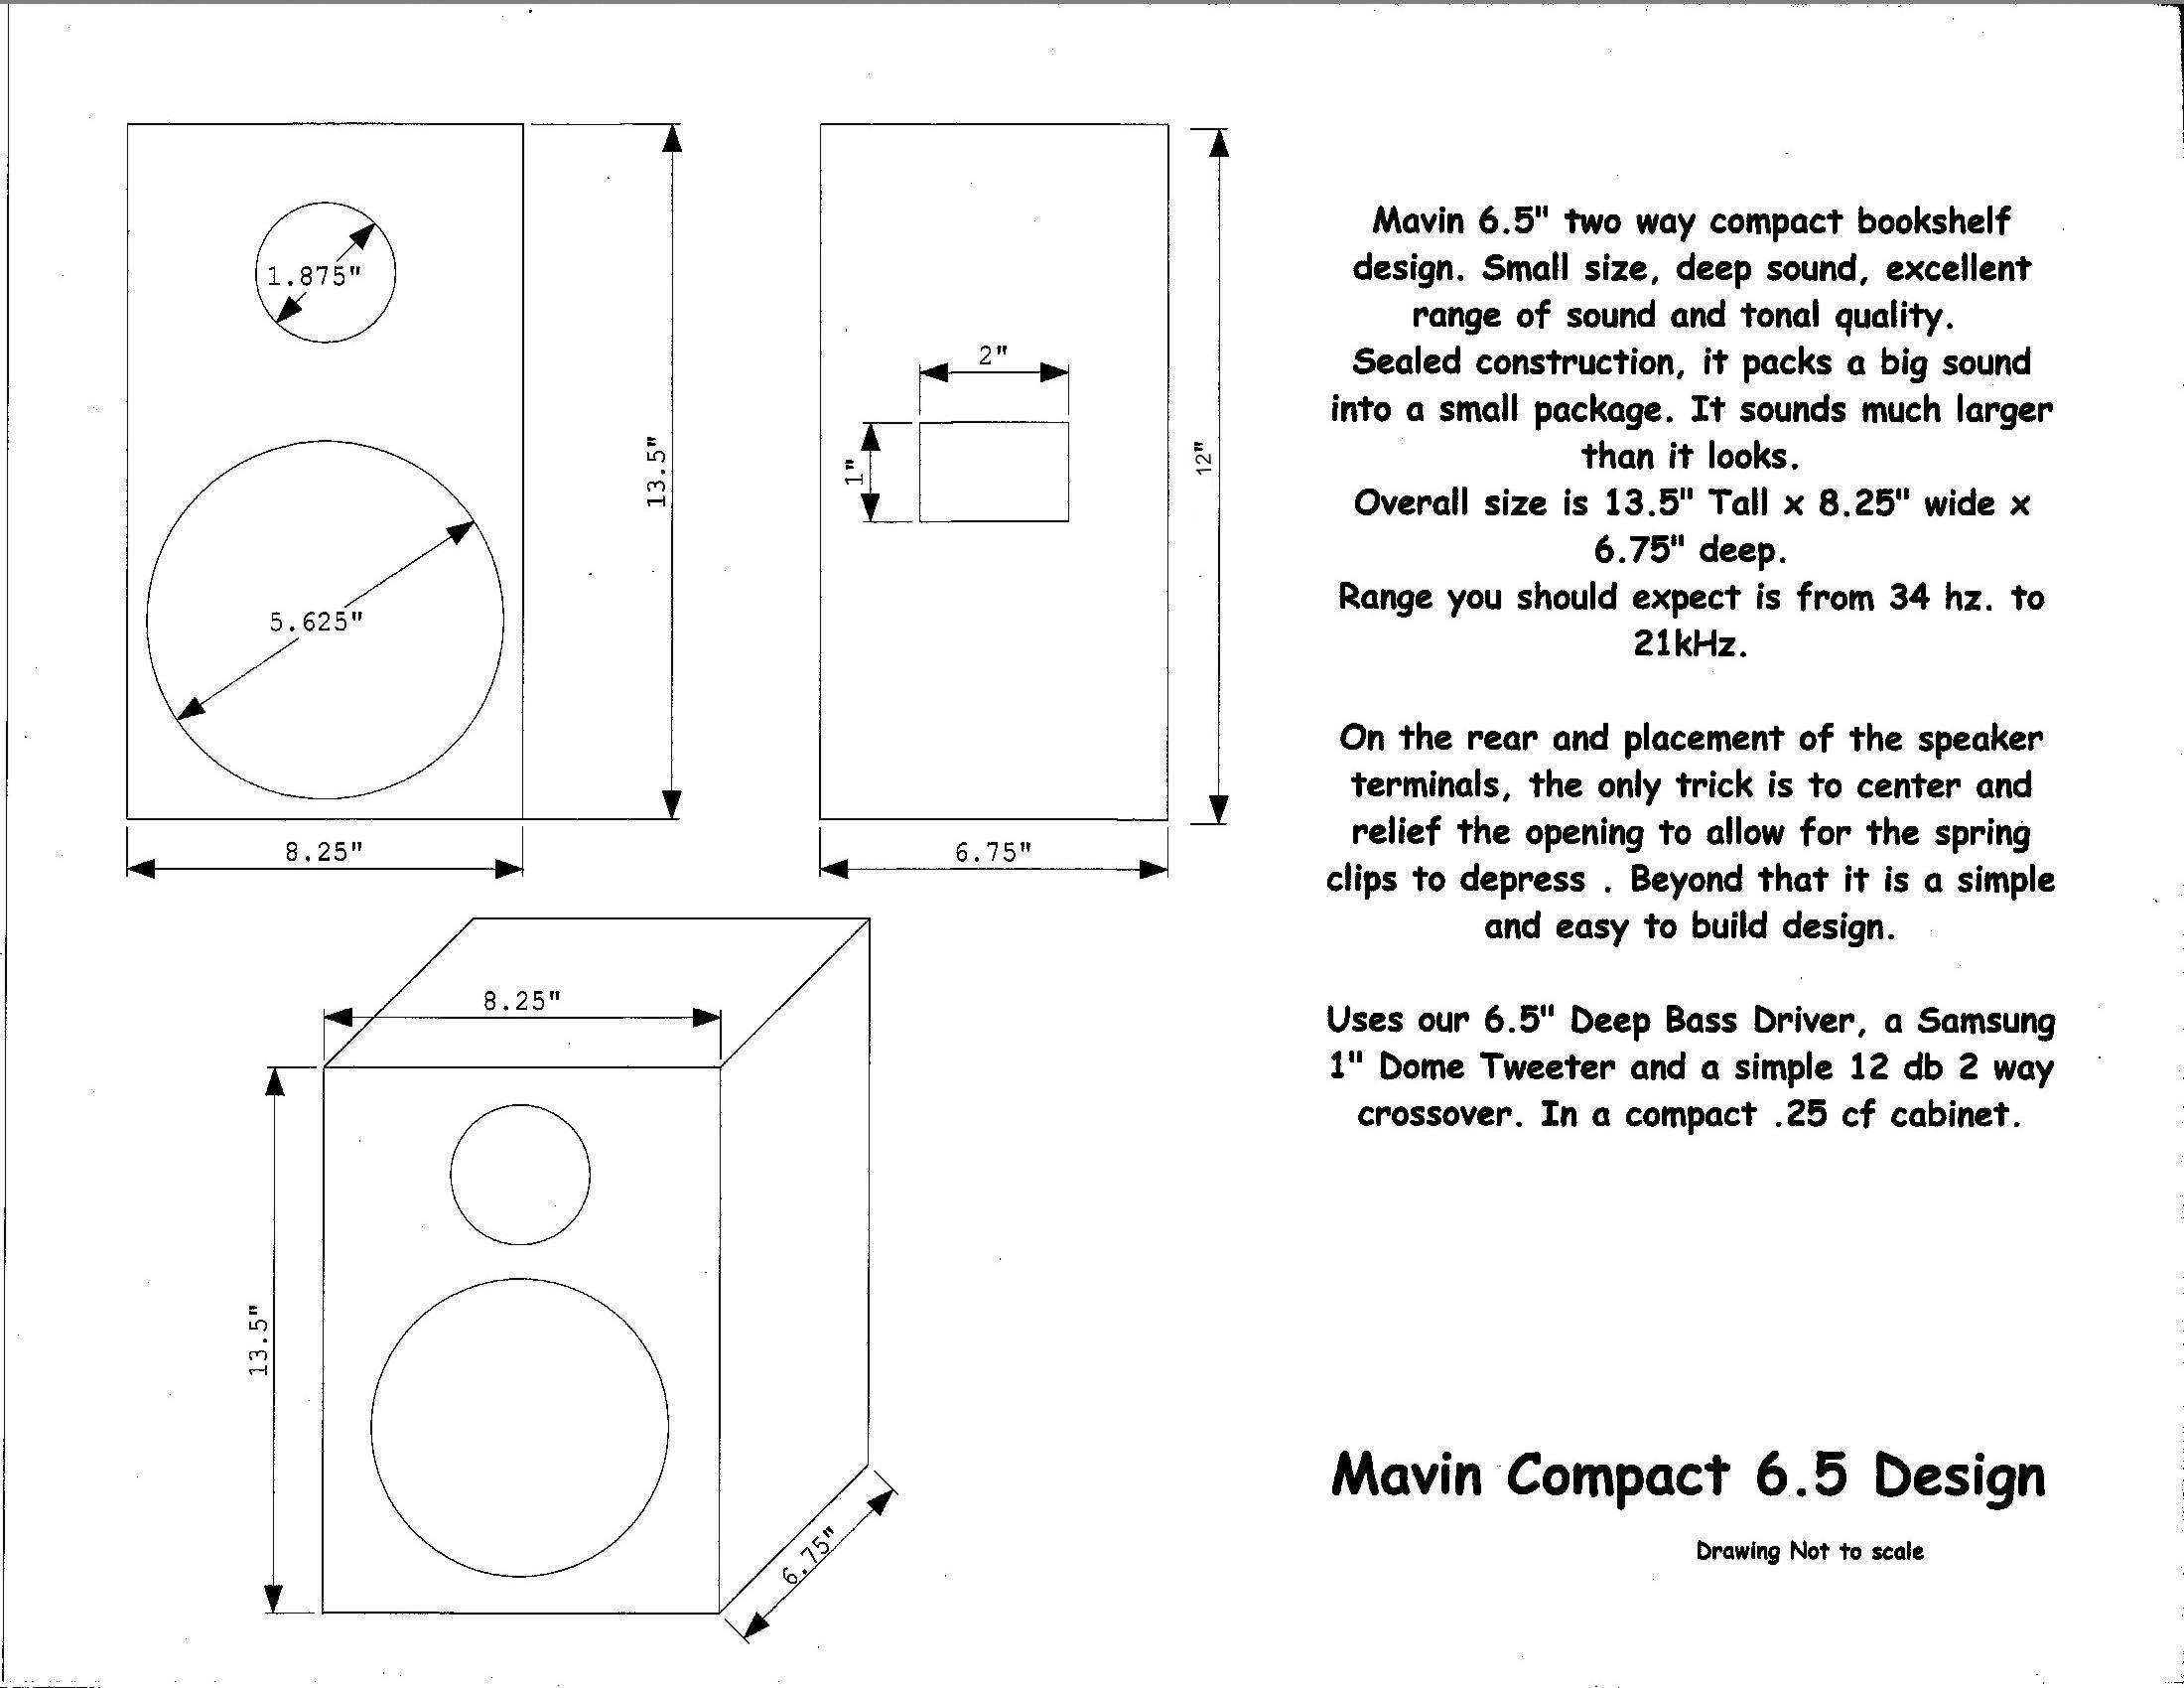 Compact Bookshelf Kit 6 5 Woofer Dome Tweeter 8 Ohms 125 Watts